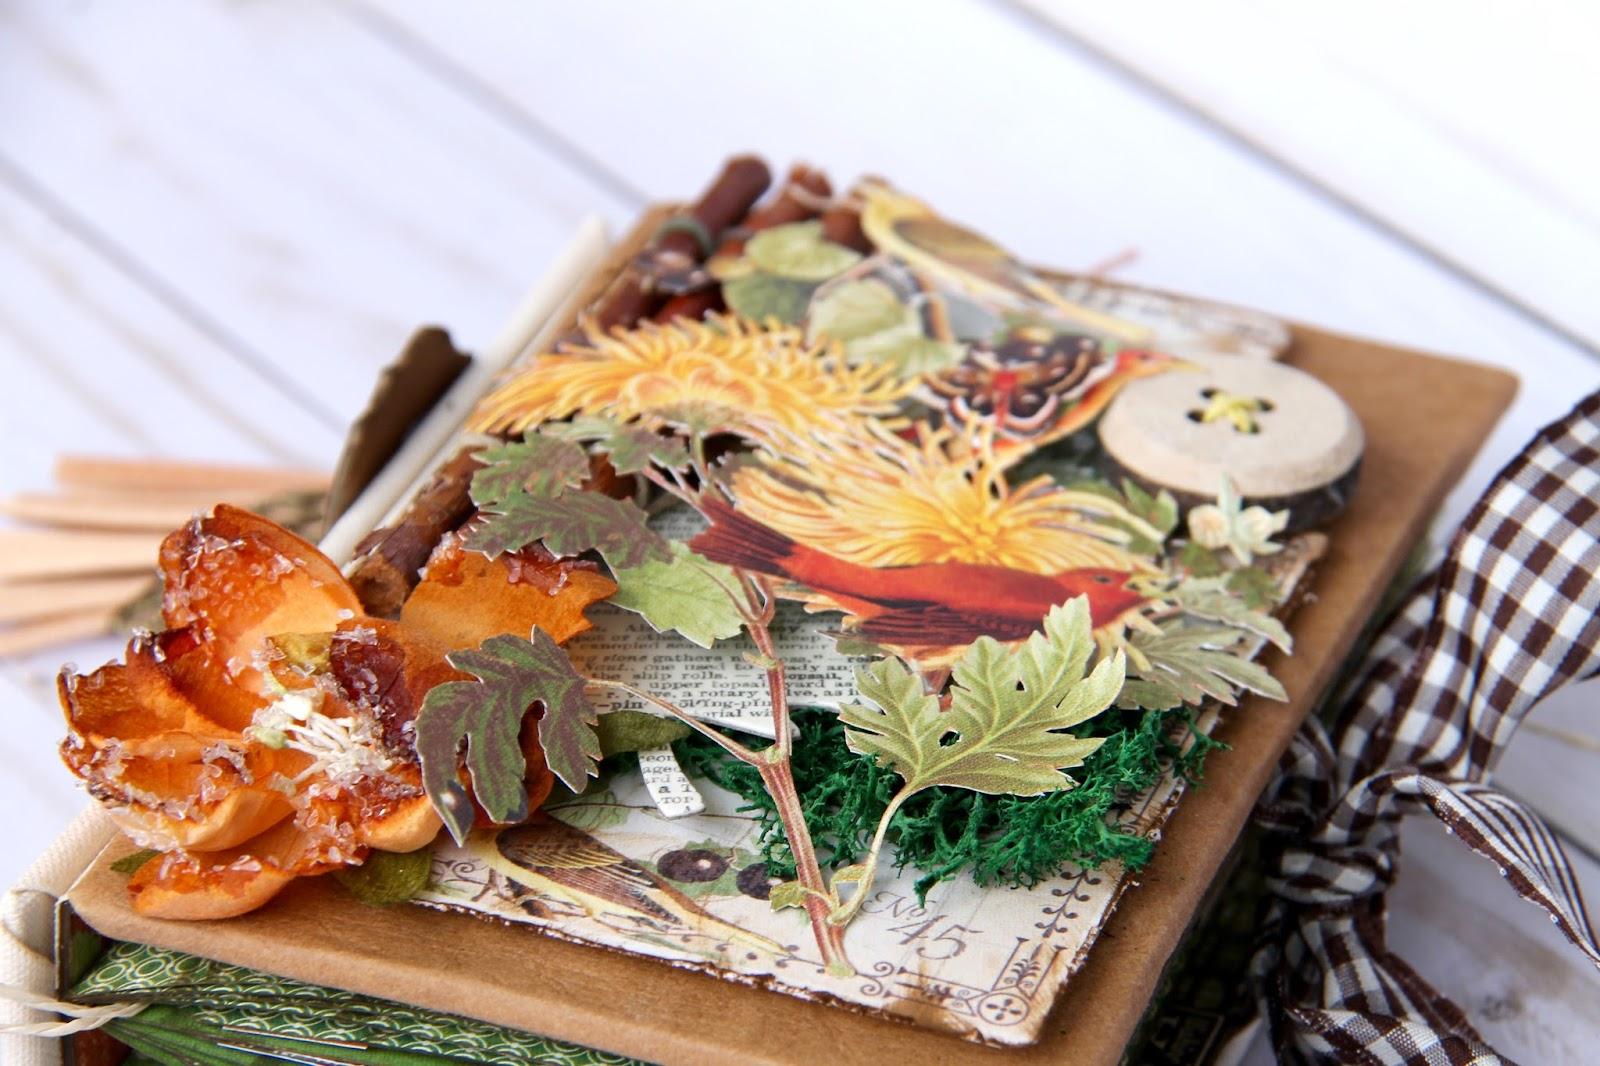 Four seasons Autumn Album by Marina Blaukitchen Product by Graphic 45 photo 9.jpg